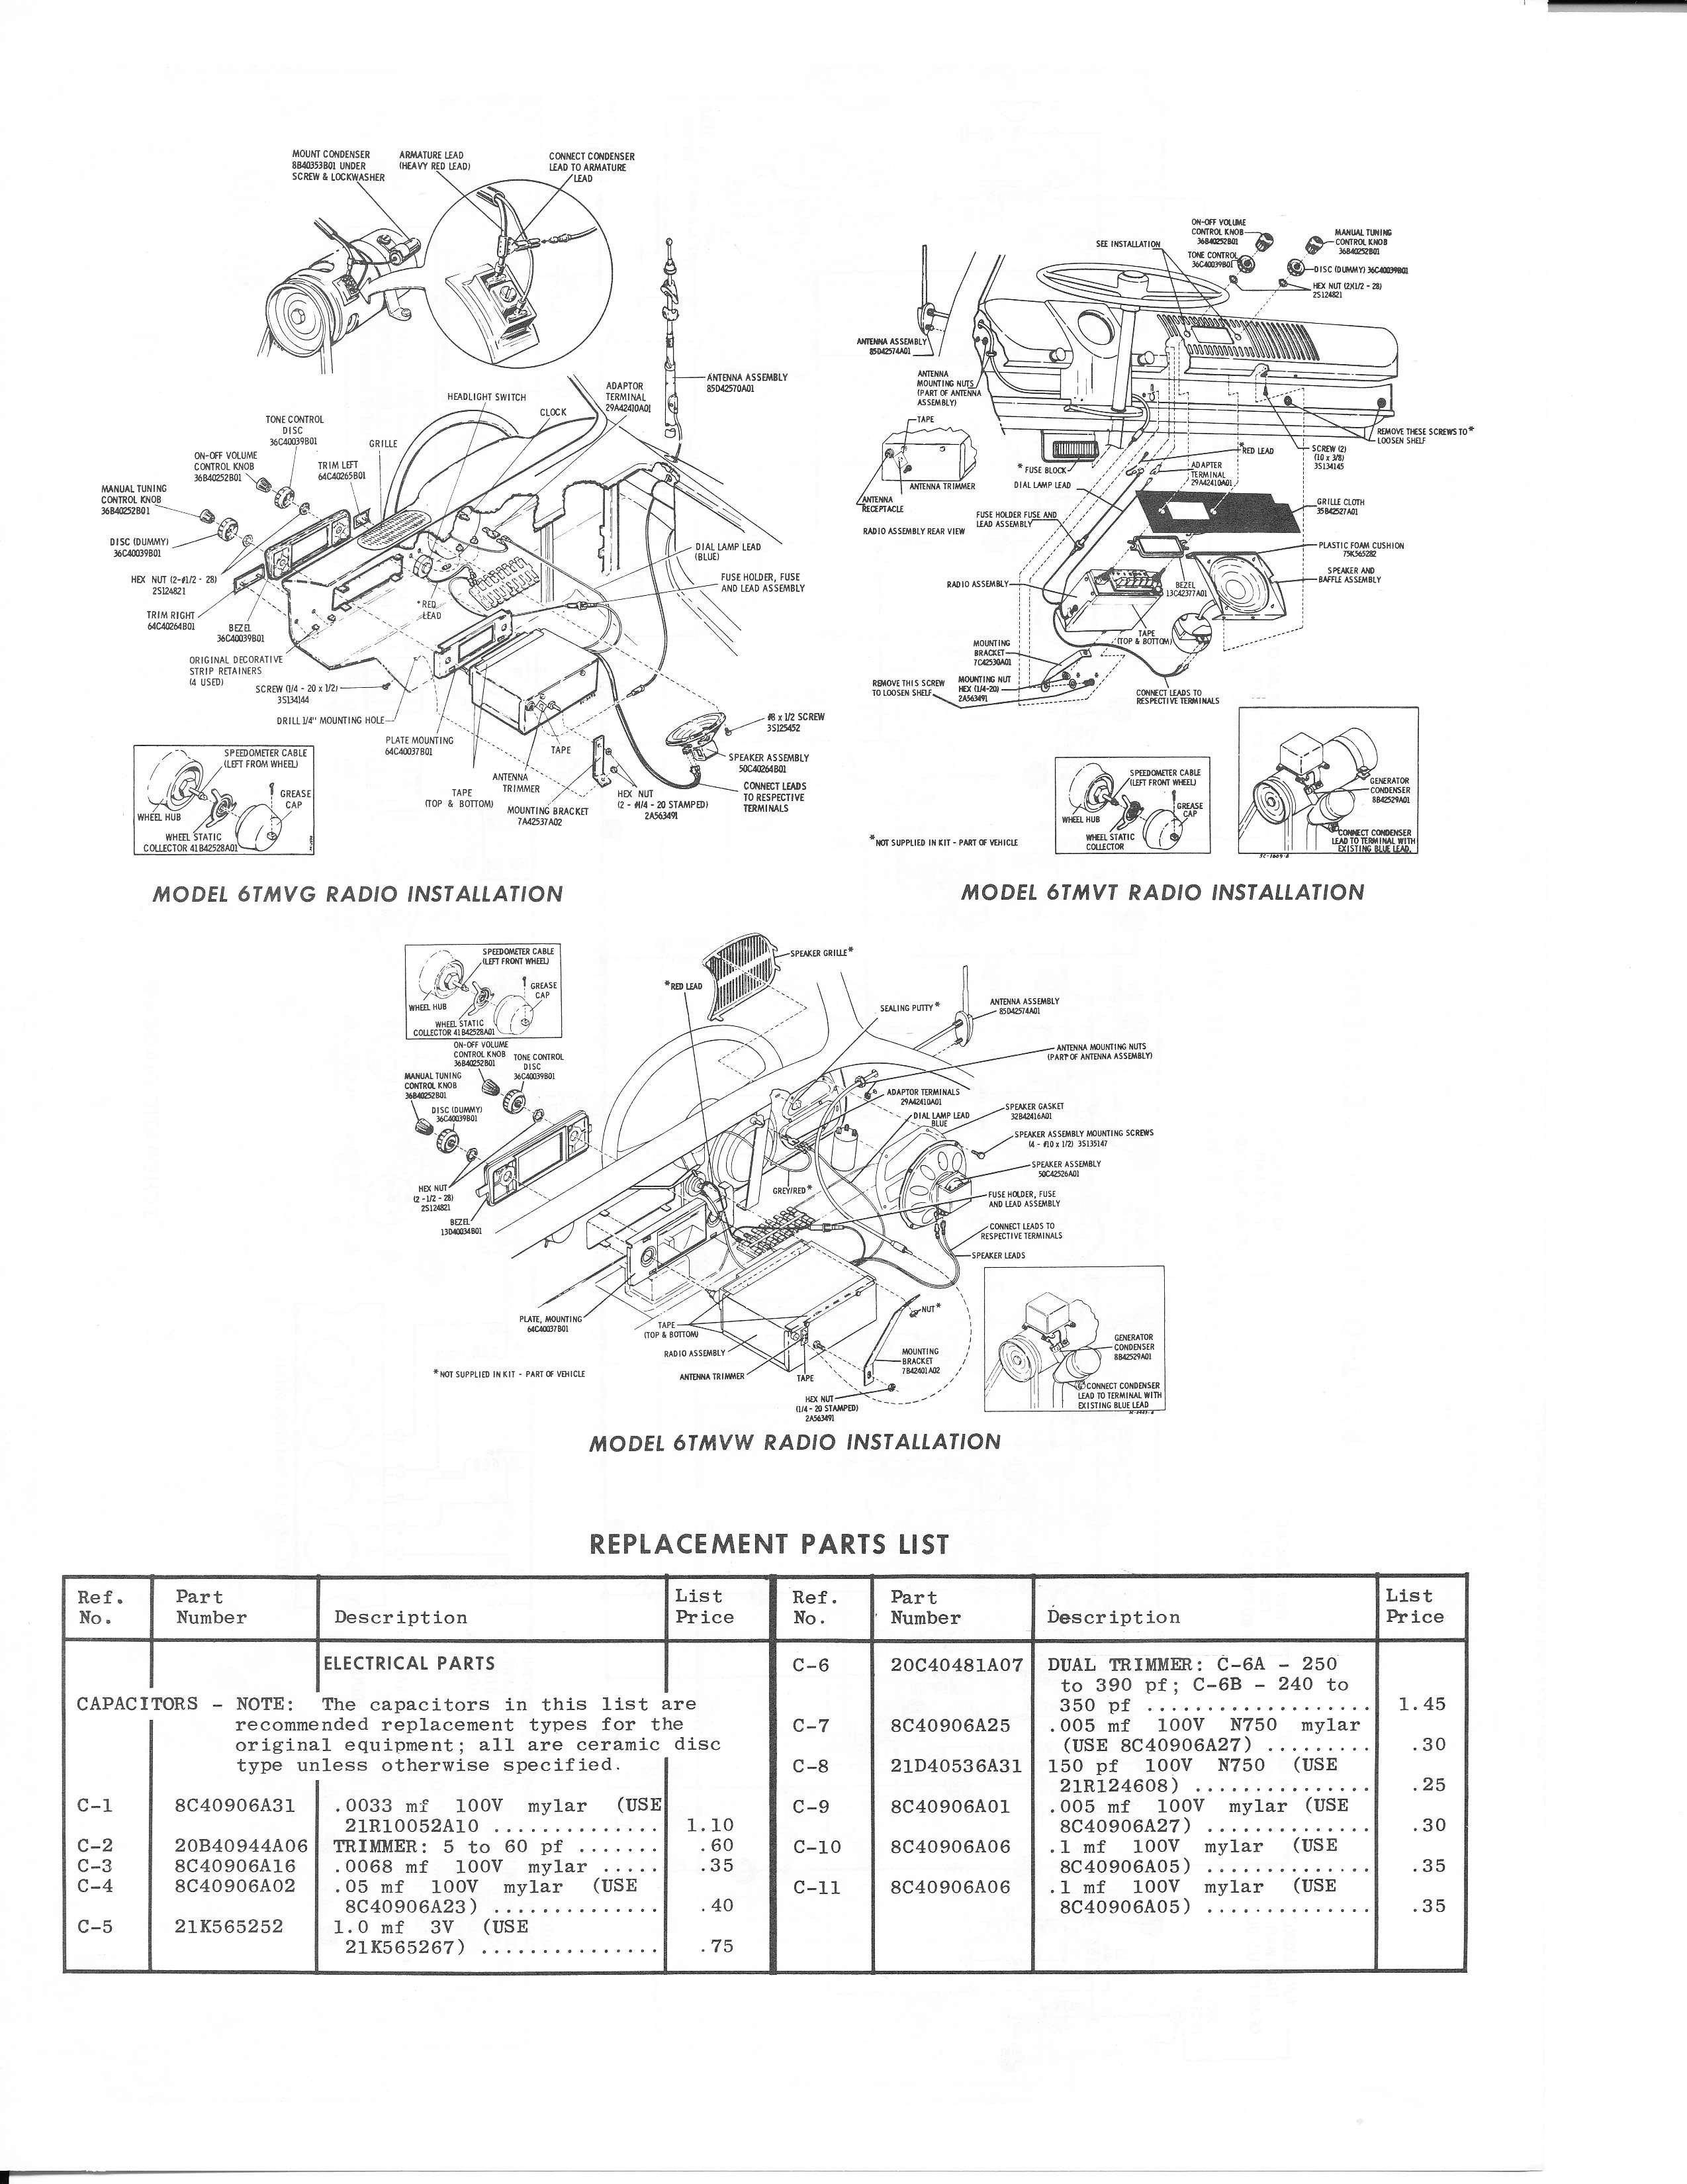 TheSamba.com :: 1966 Motorola Sapphire III Service Manual